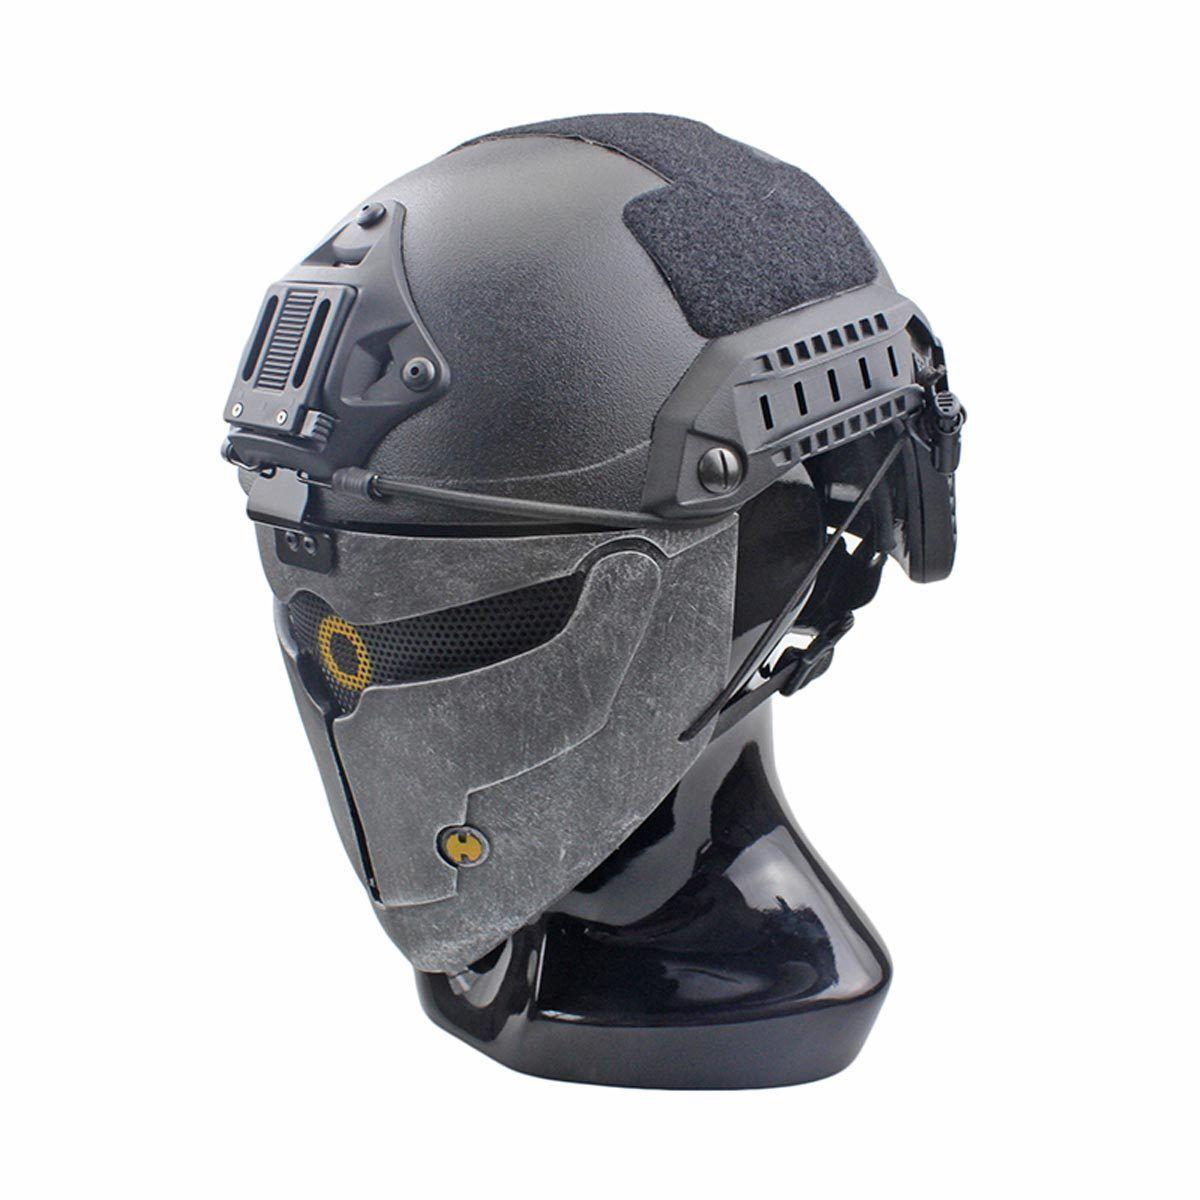 Handmade Wire Mesh Glass Fiber Resin Airsoft CS Half Face mask For Helmet M102